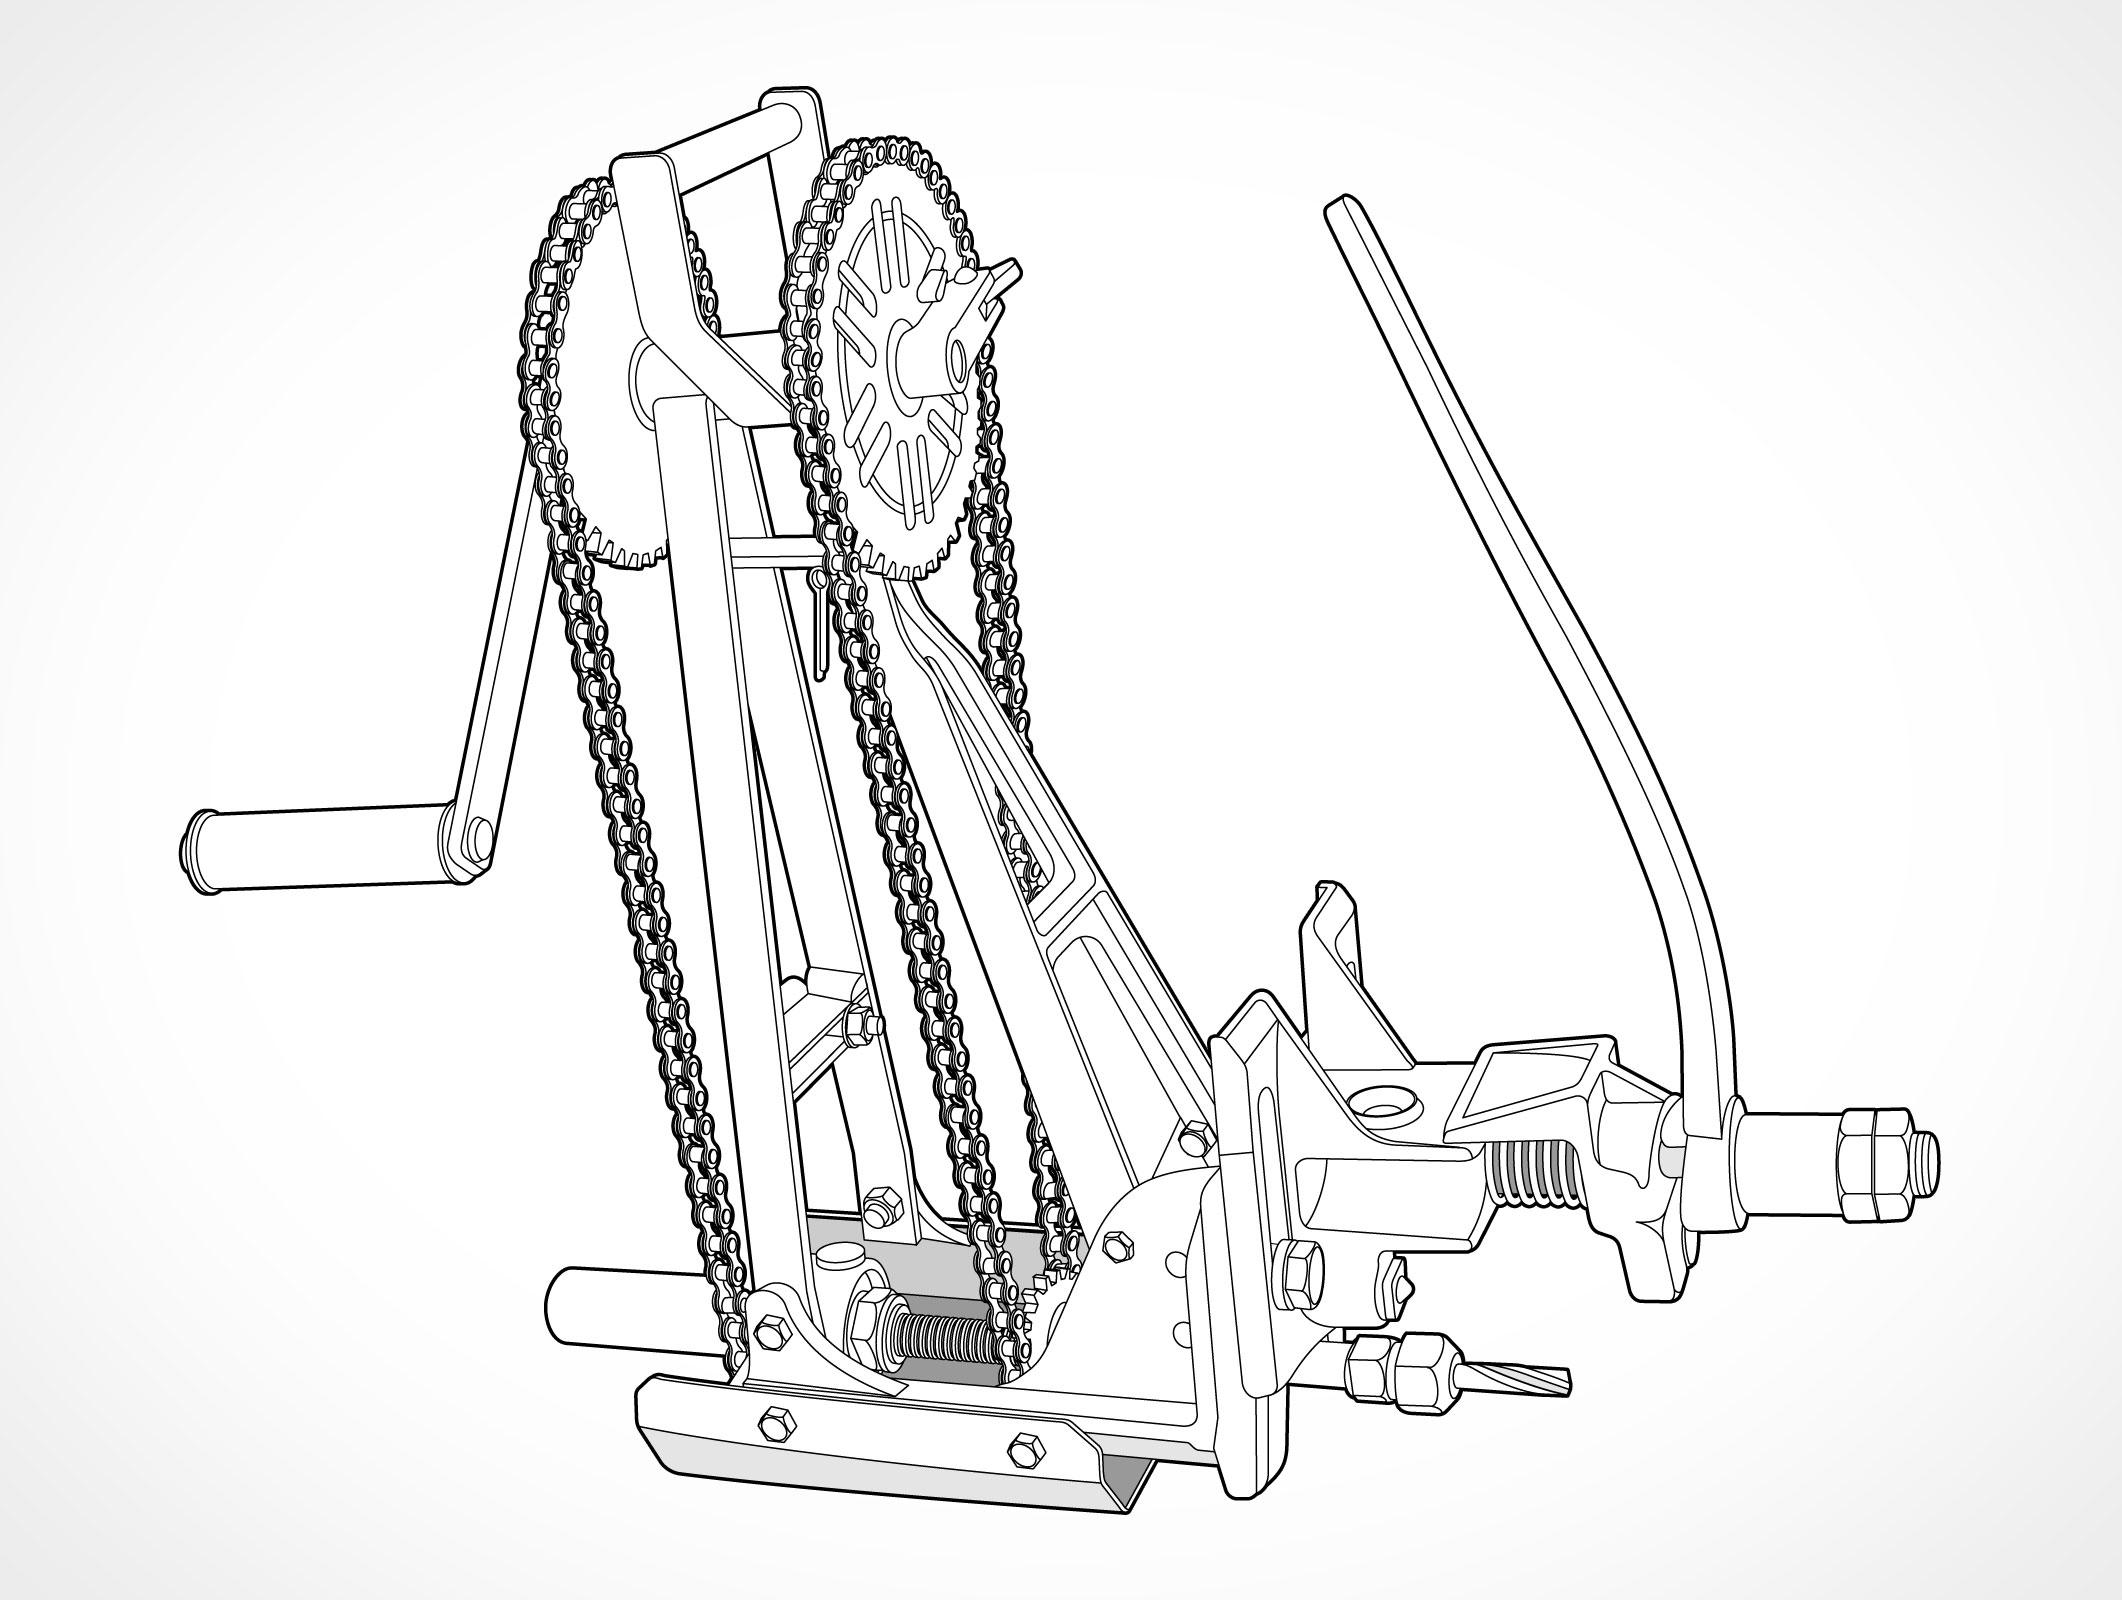 VECTOR manual: Drill Bonding Manual Vector